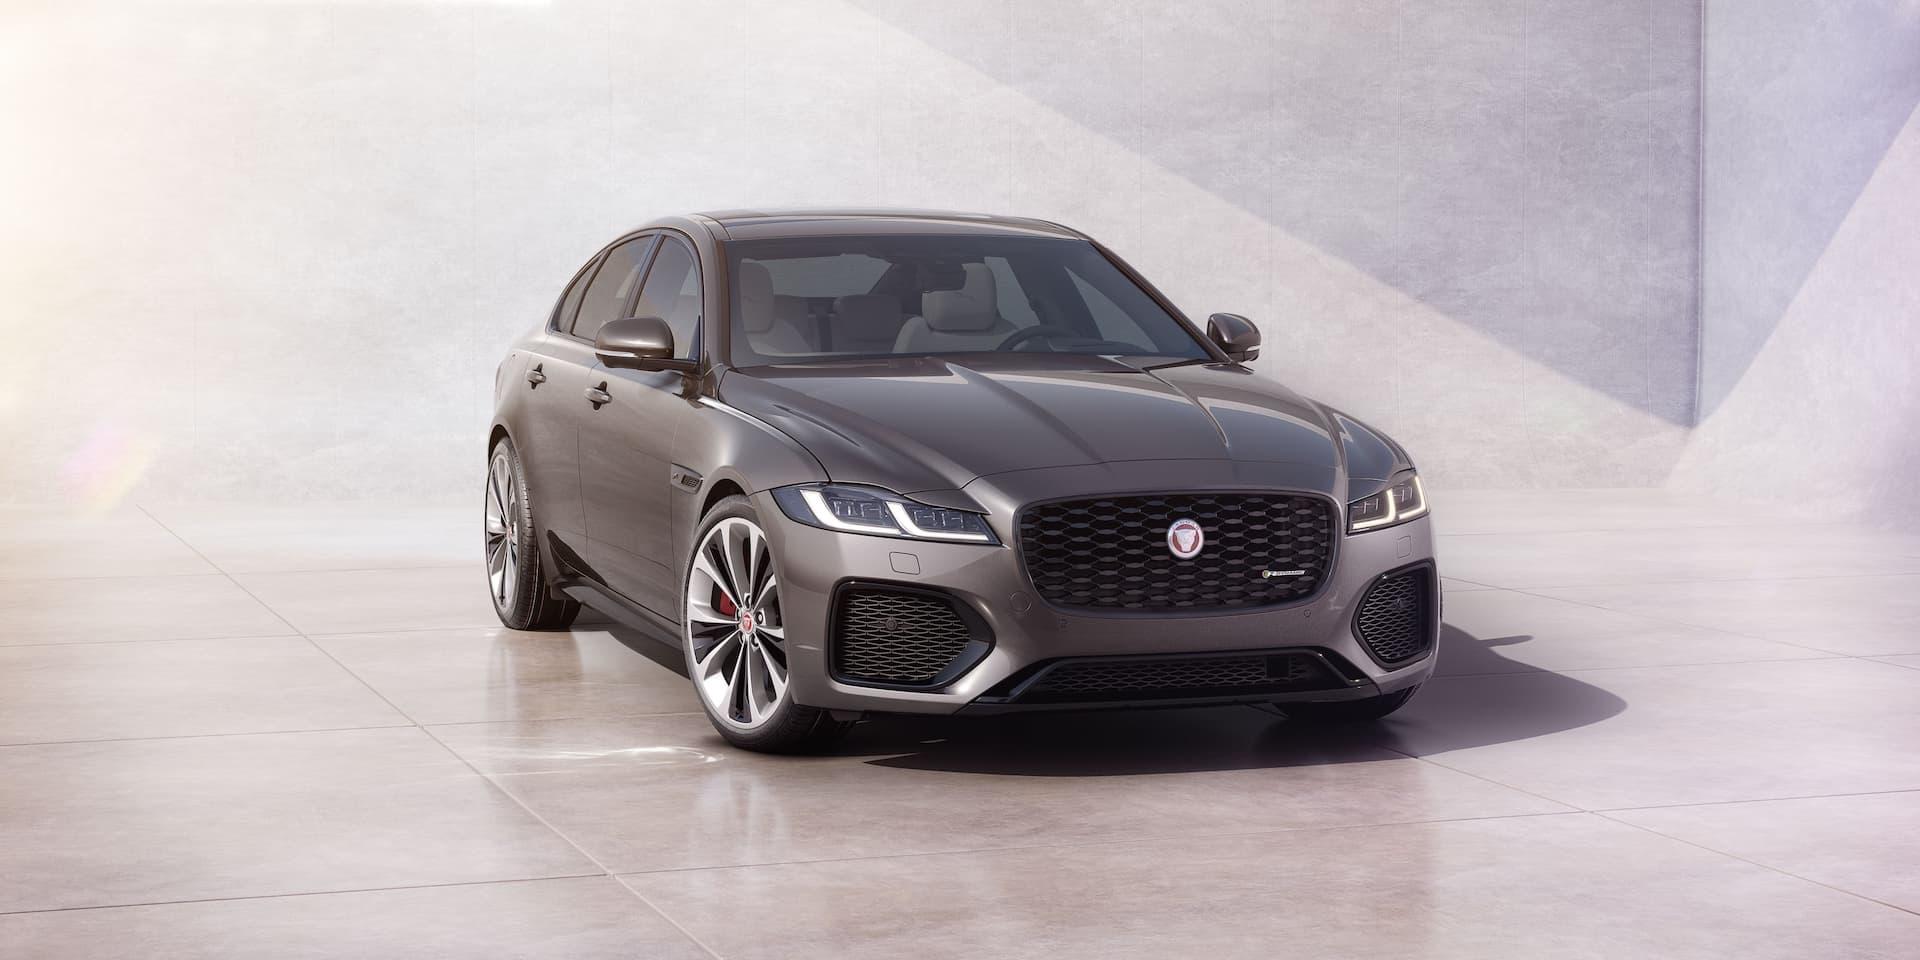 2021 Jaguar XF saloon